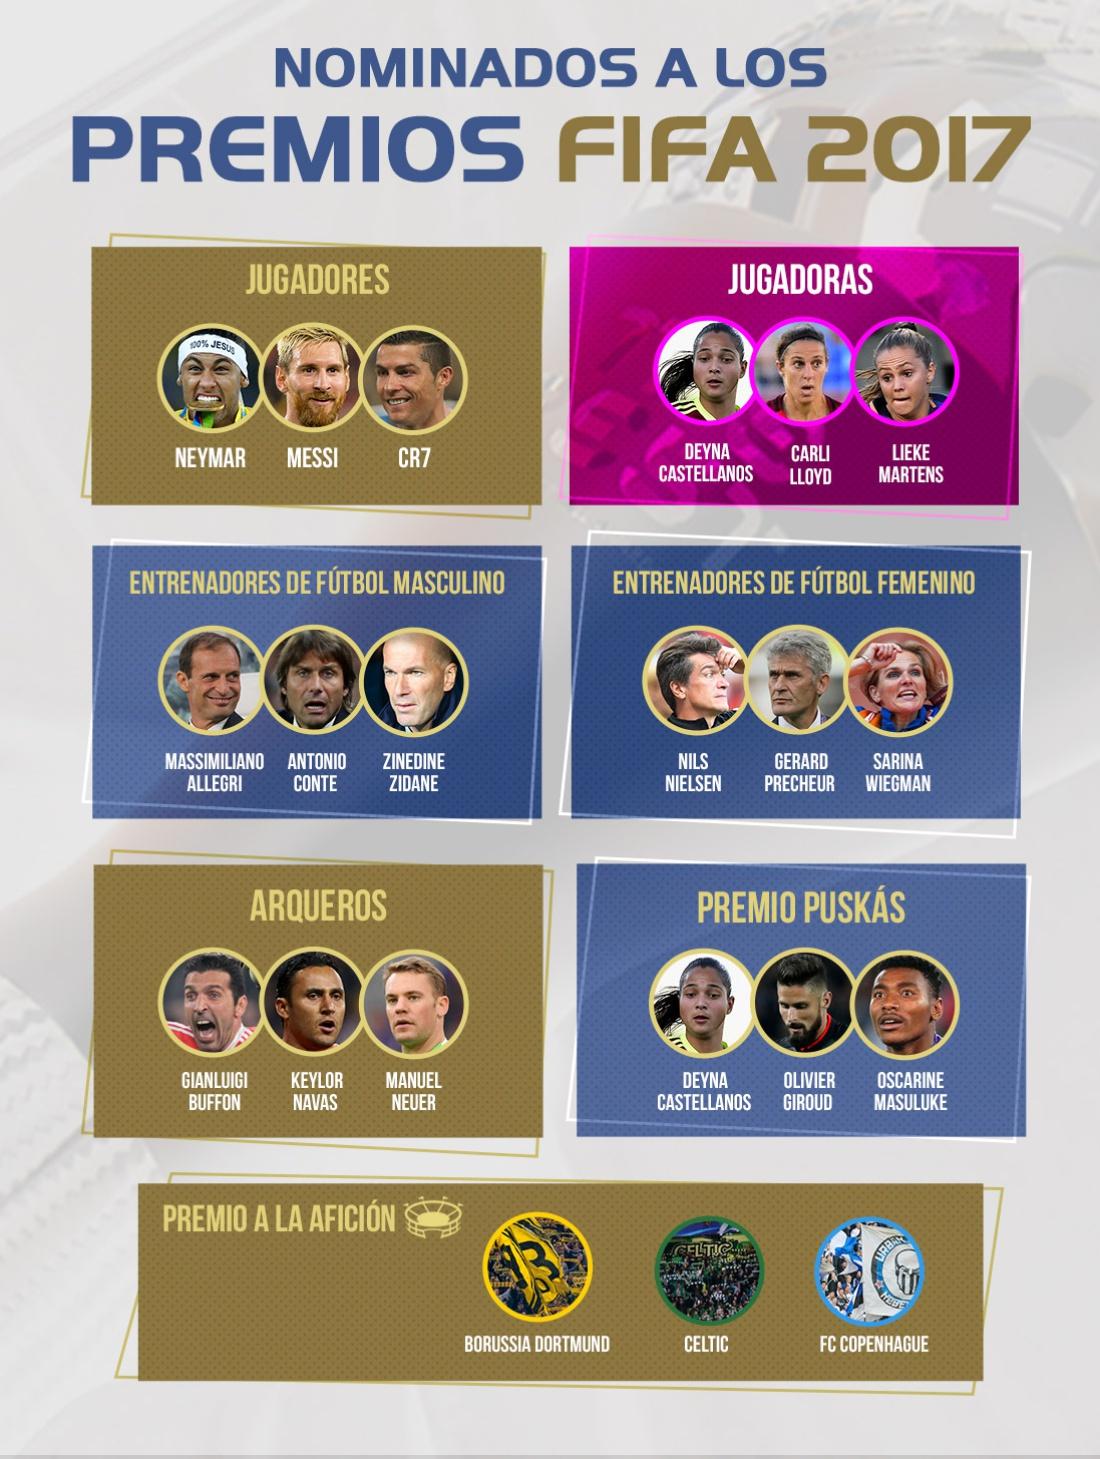 The Best 2017: The Best 2017, la FIFA premia a los mejores del mundo